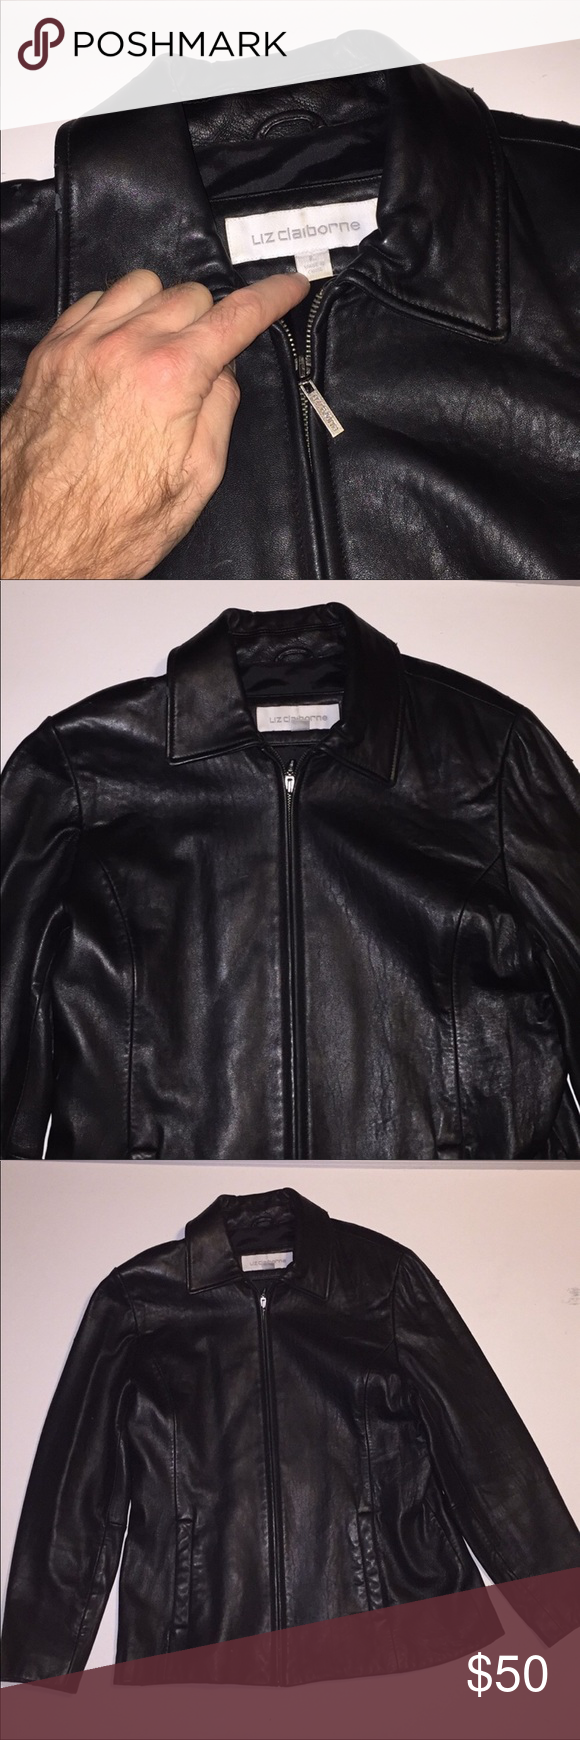 Liz Claiborne Genuine Black Leather Jacket Large Leather Jacket Black Leather Jacket Black Leather